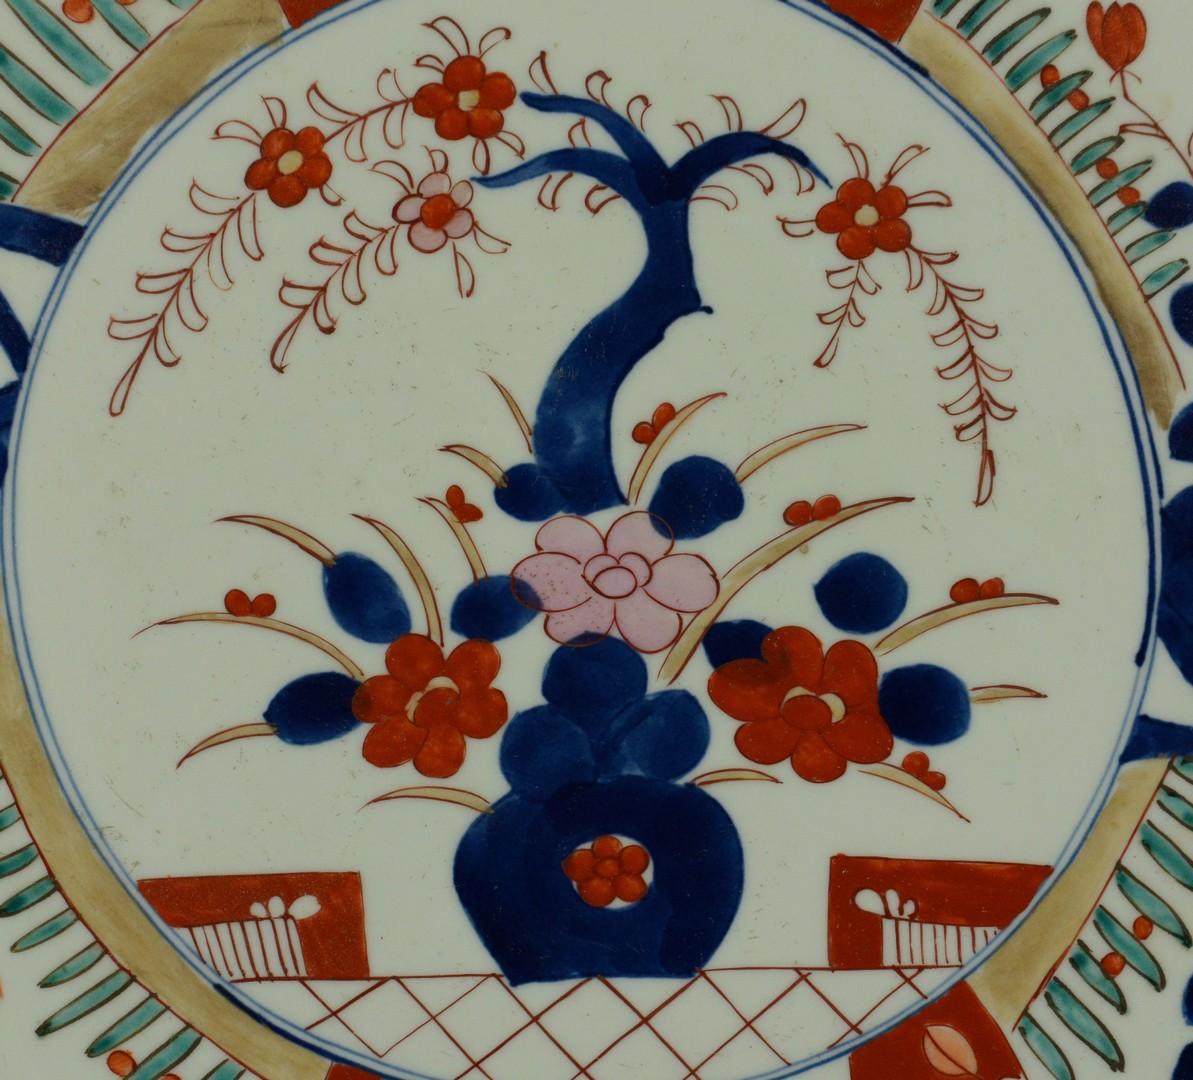 Lot 3383235: Japanese Imari Porcelain Charger